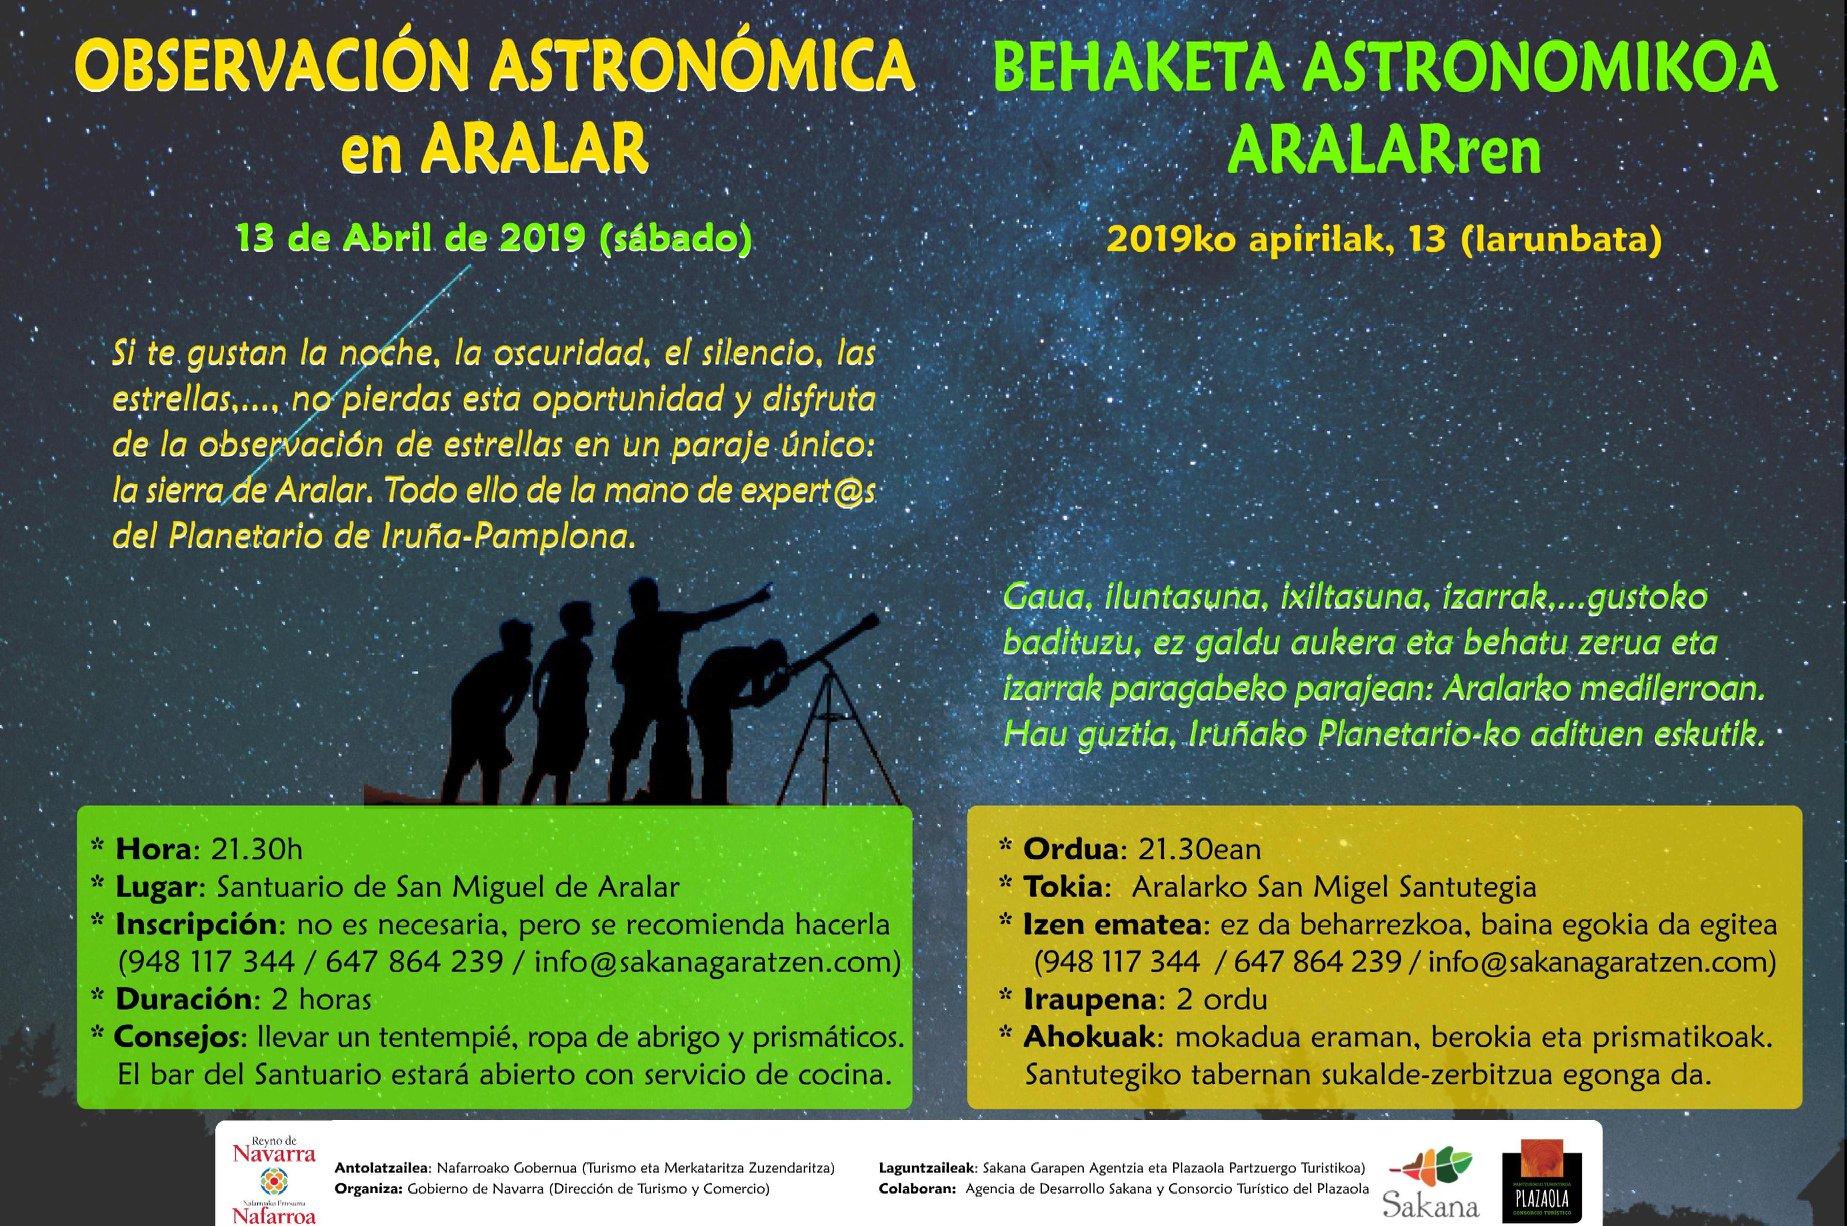 observación astronomica en aralar